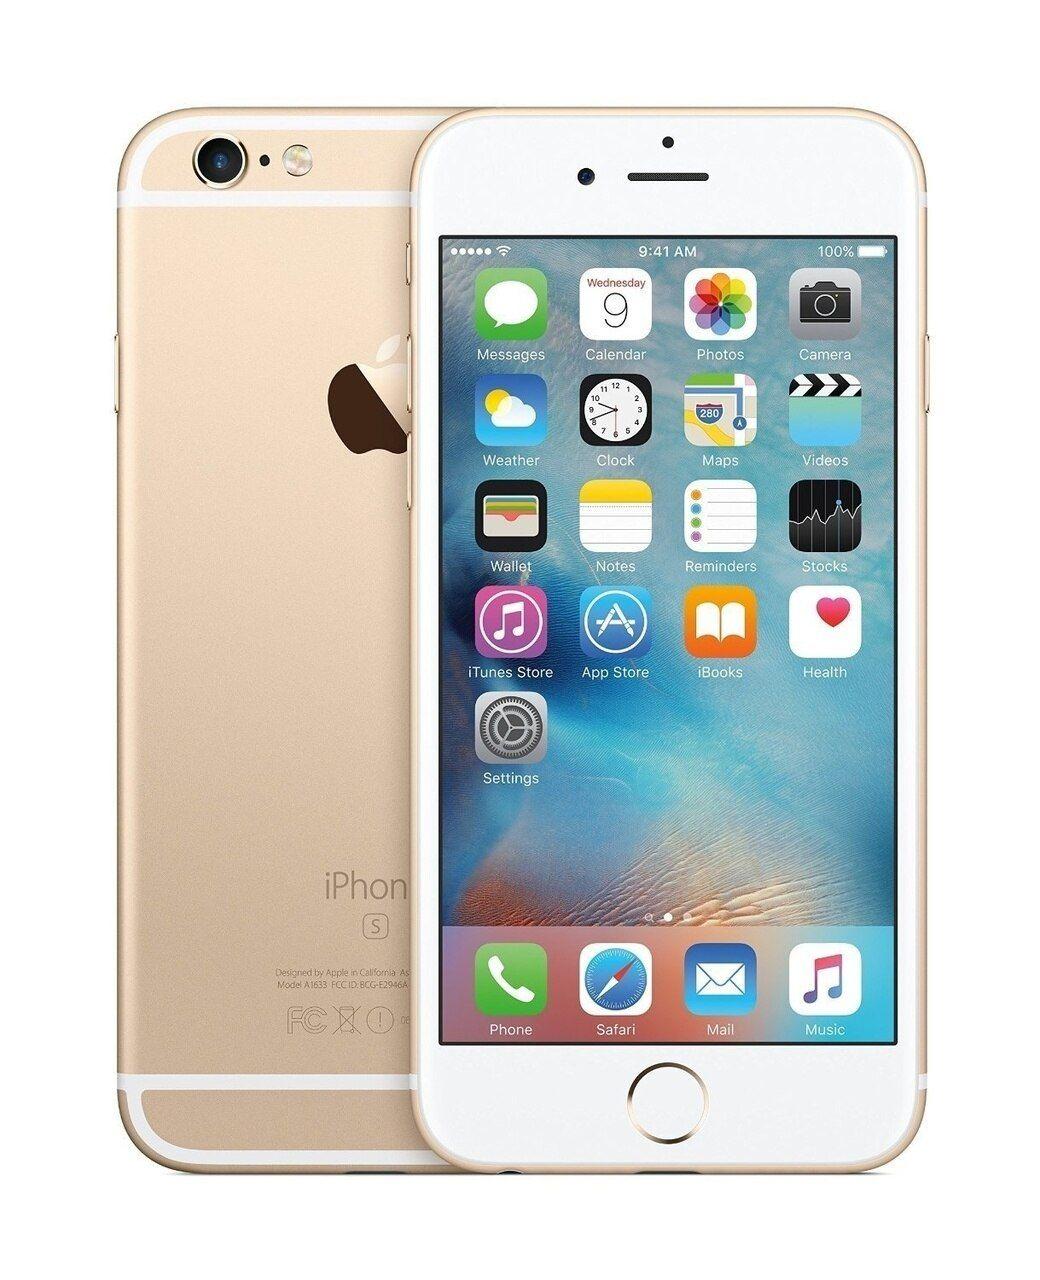 Apple Iphone 6 16gb Gsm Unlocked 4g Lte Smartphone Refurbished Iphone Apple Iphone Apple Iphone 6s Plus